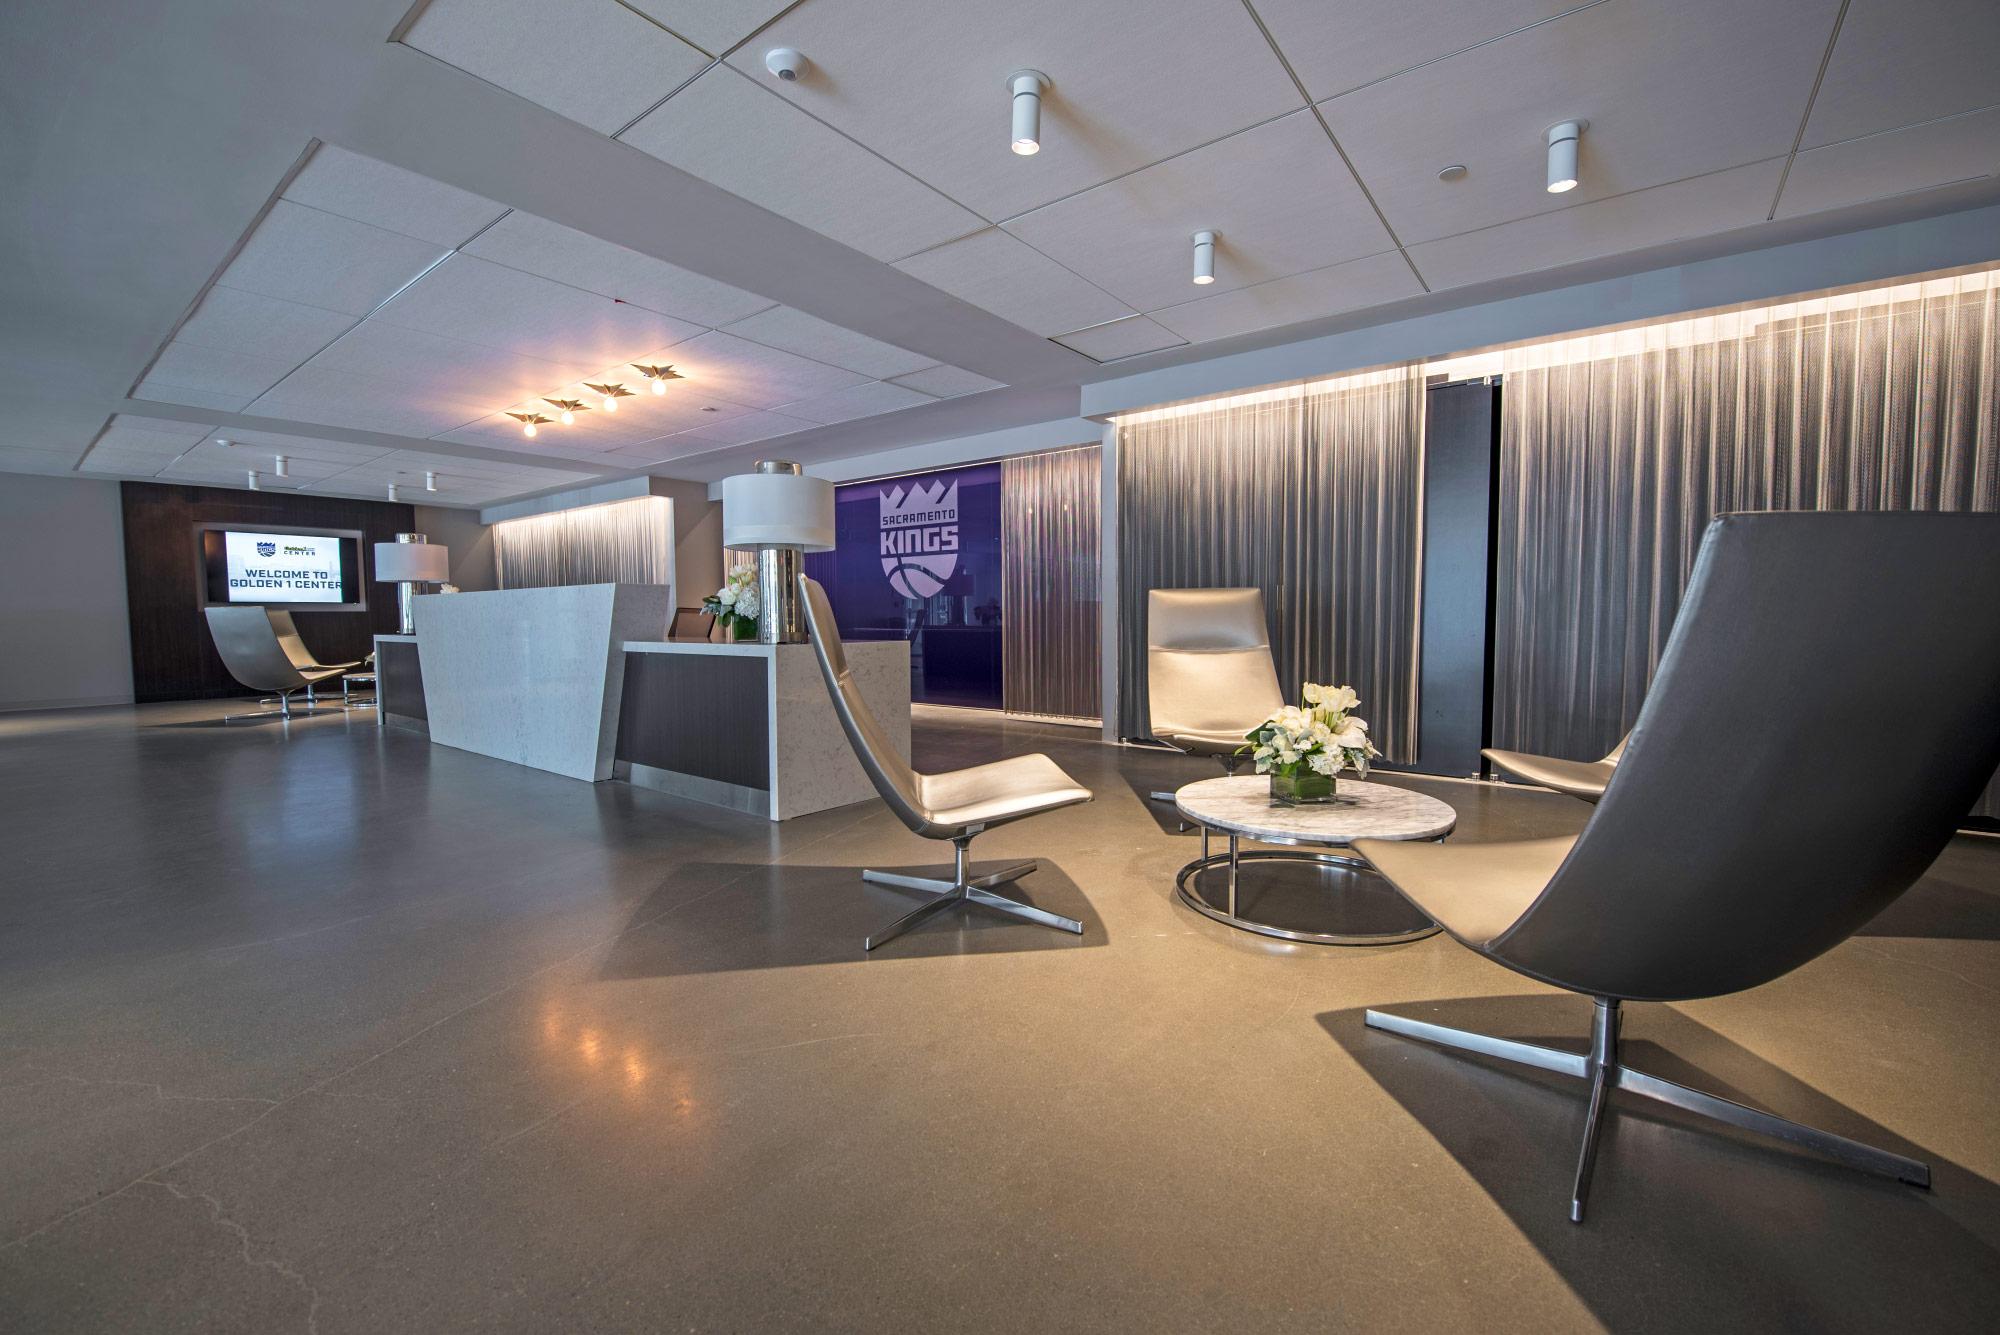 VIP entrance lounge area